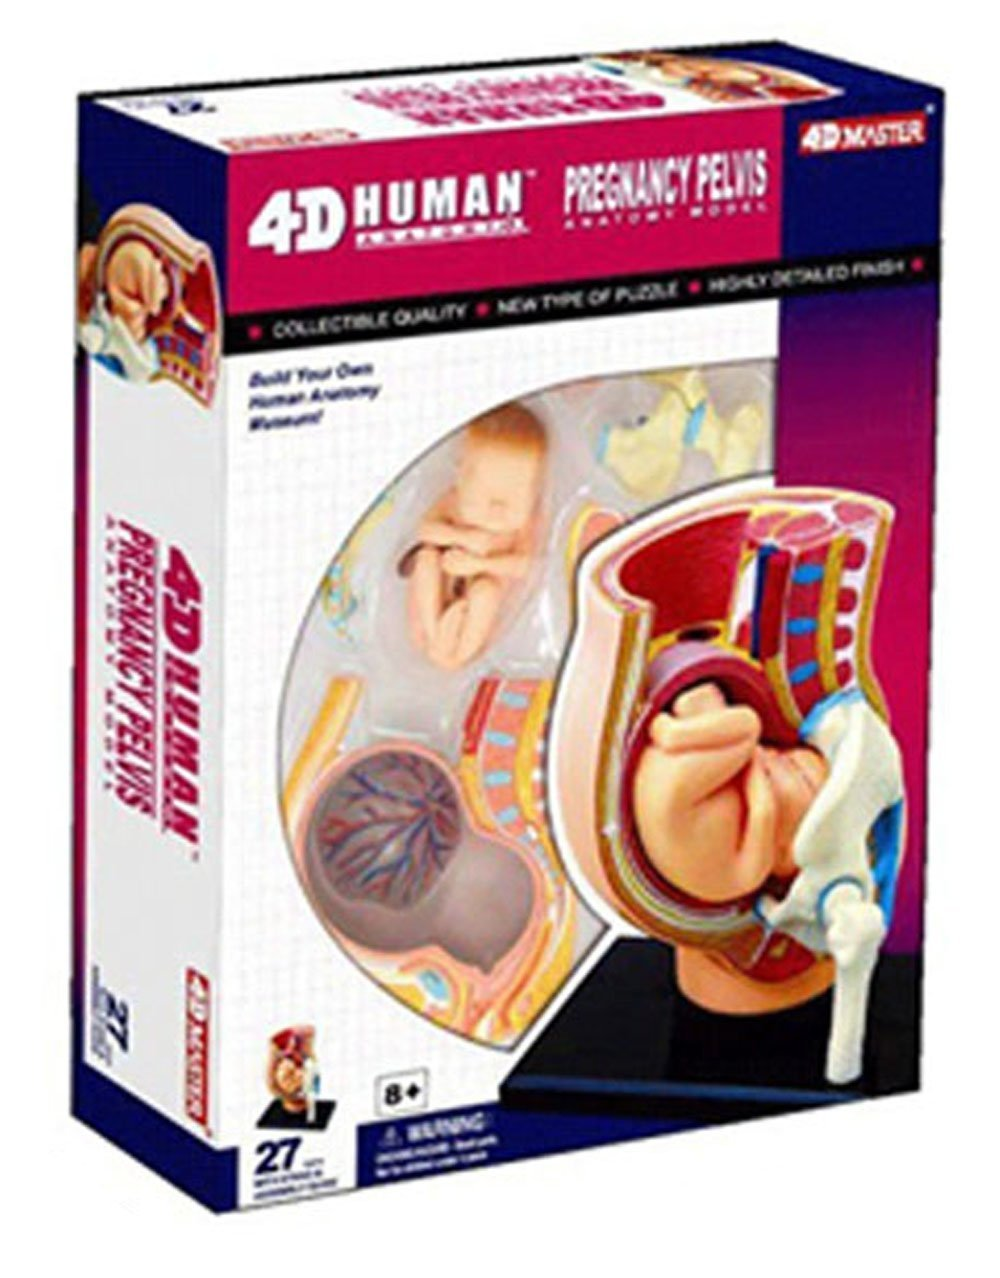 Amazon.com: 4D Vision Human Anatomy - Pregnancy Anatomical Model ...